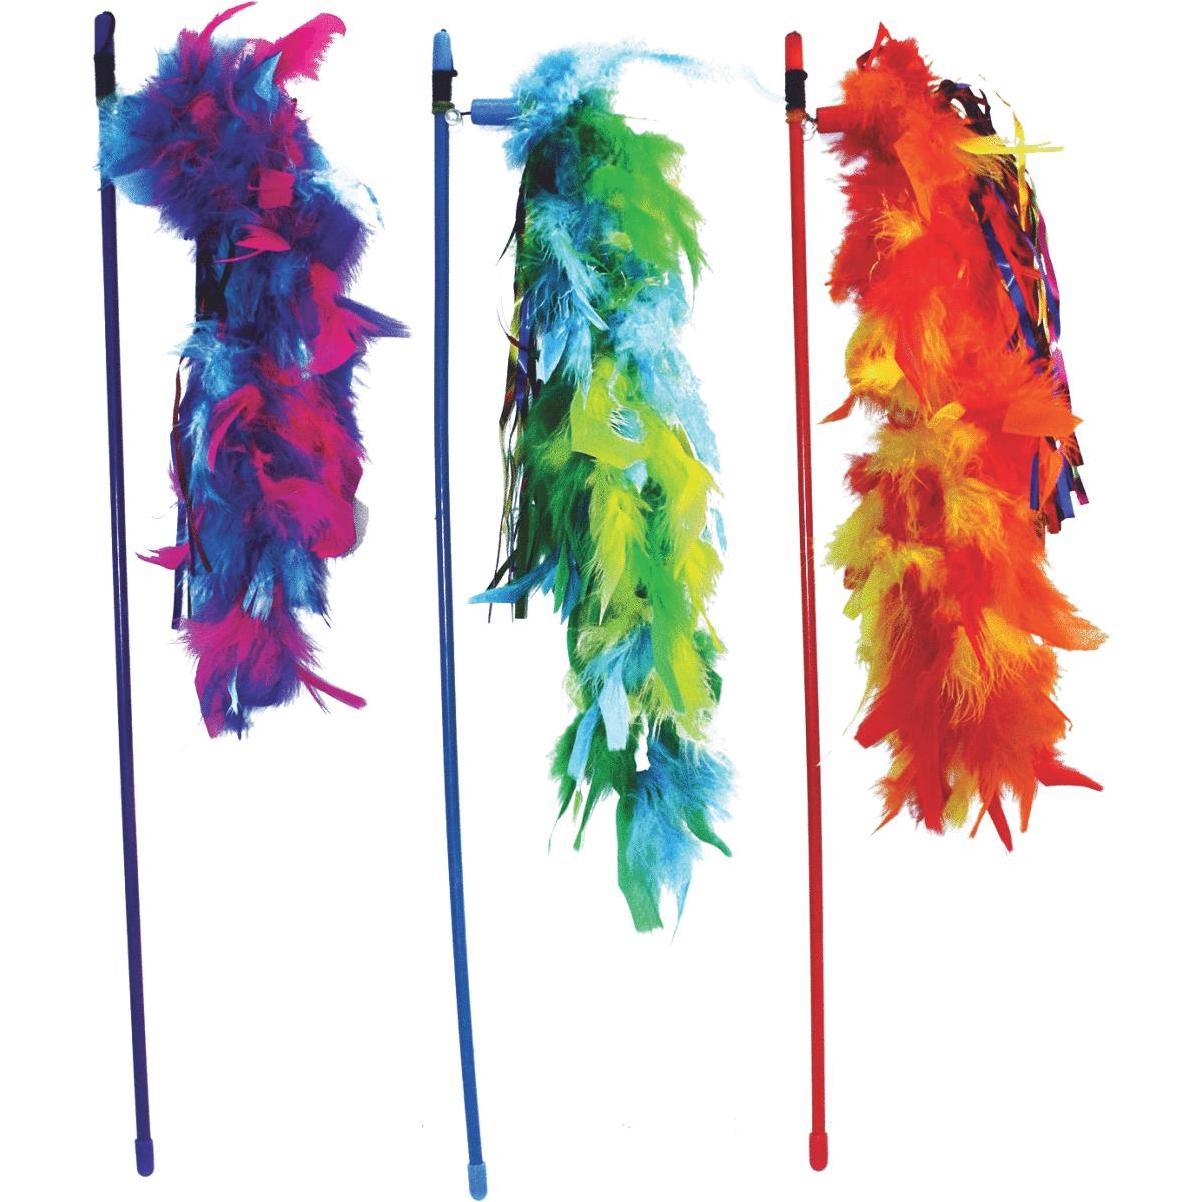 Multipet Cat Dangler Wand, Assorted Colors